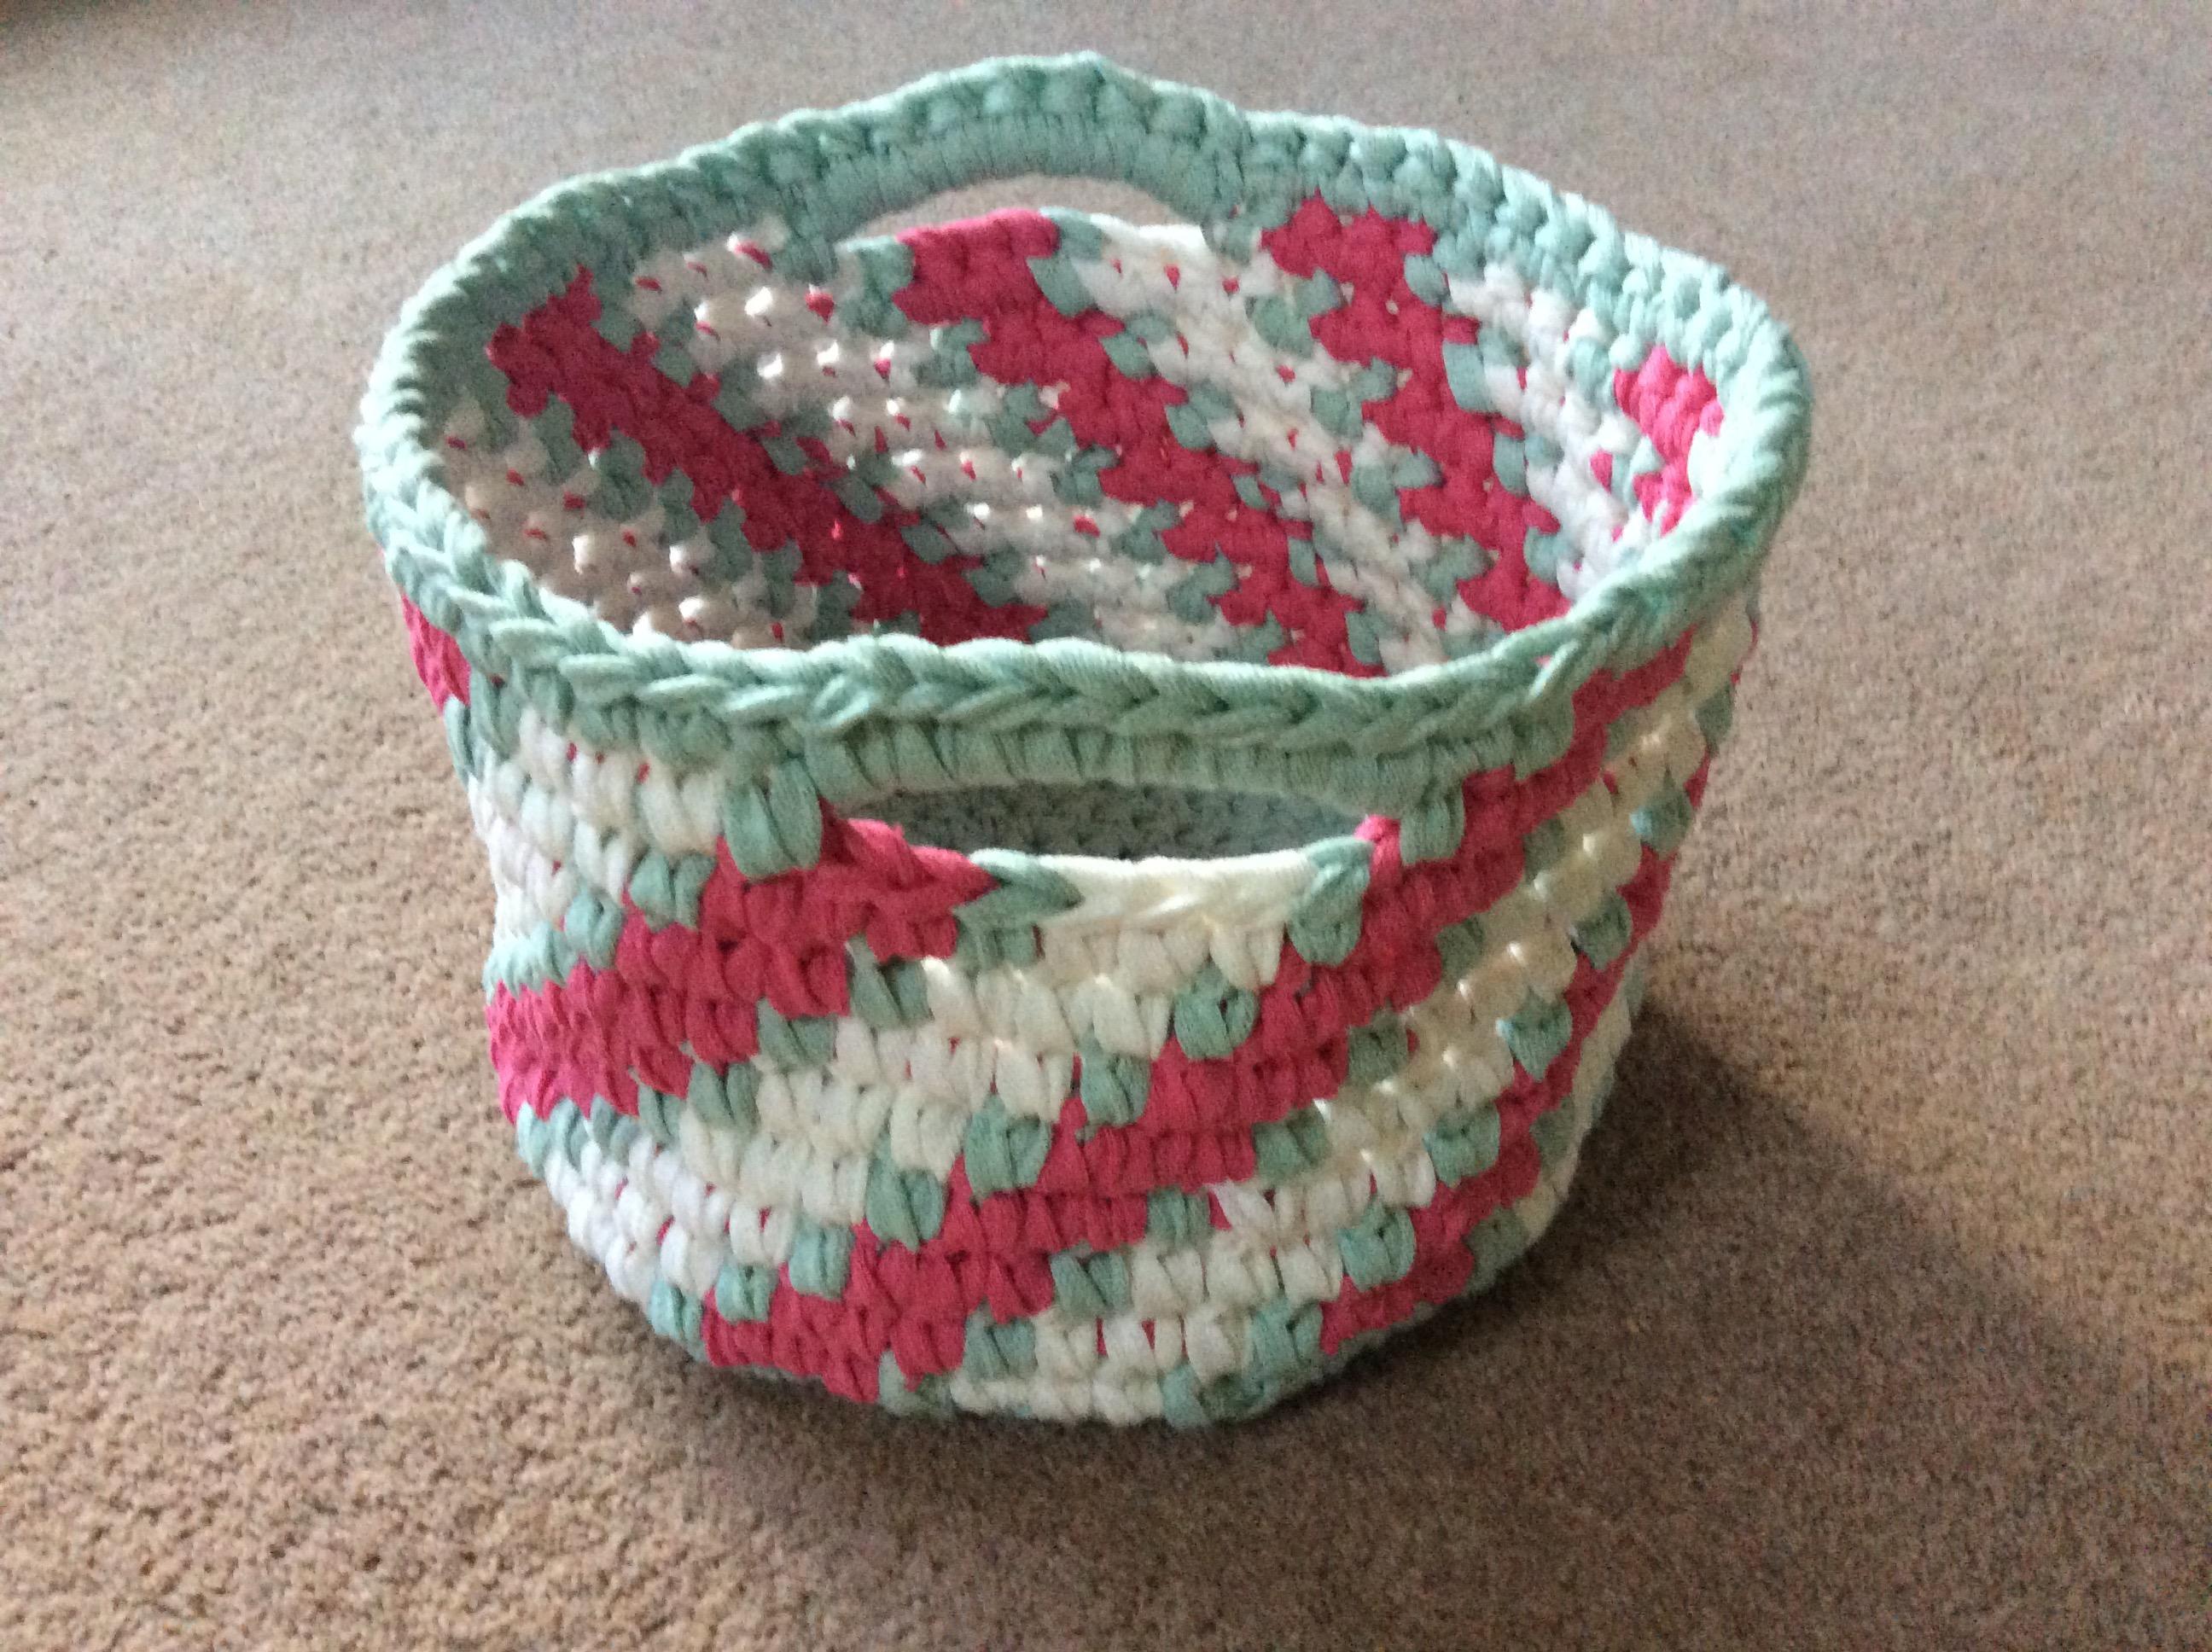 Crochet Candy-Striped Basket Workshop